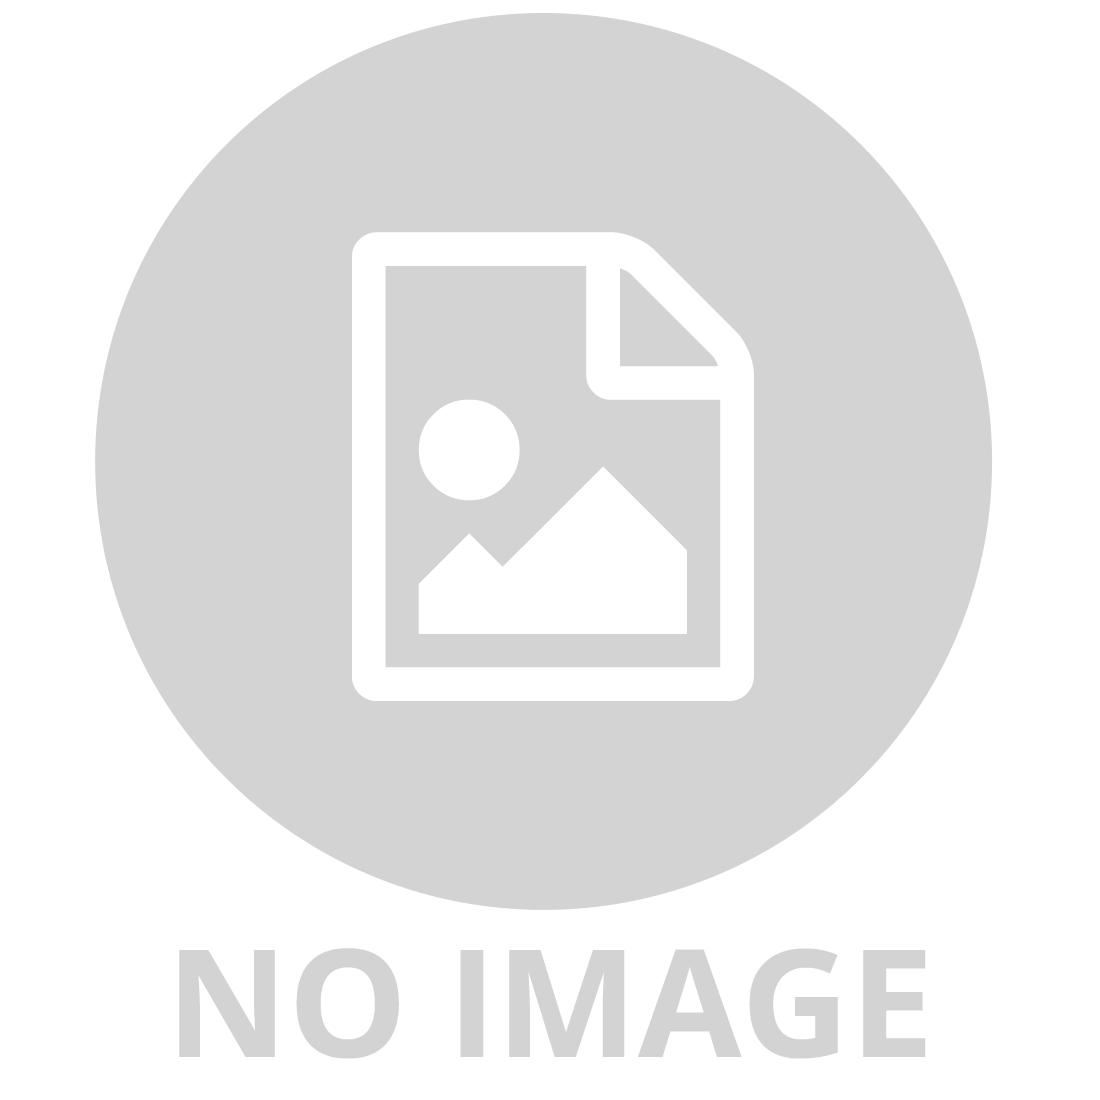 RAVENSBURGER WORLD OF HORSES PUZZLE 2 X 24 PIECE